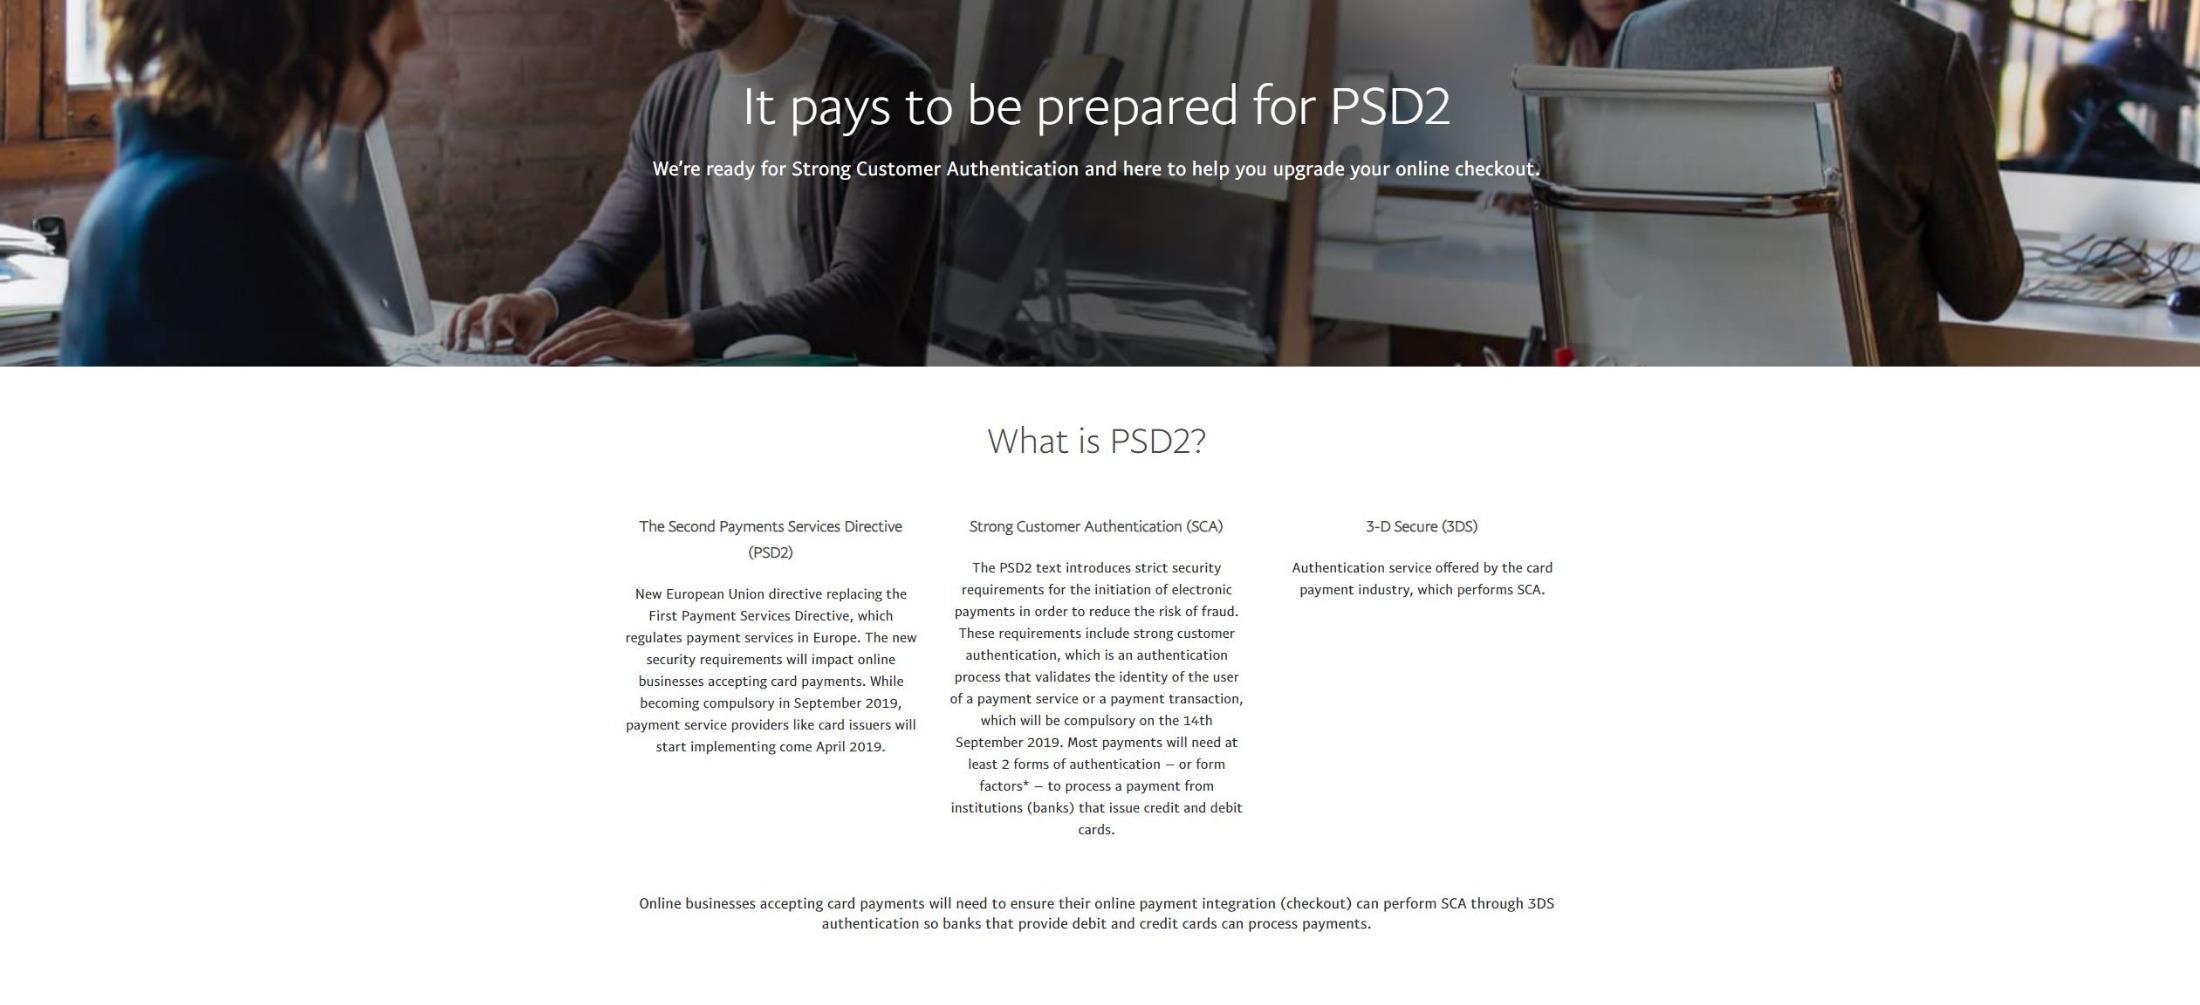 PSD2-01.JPG